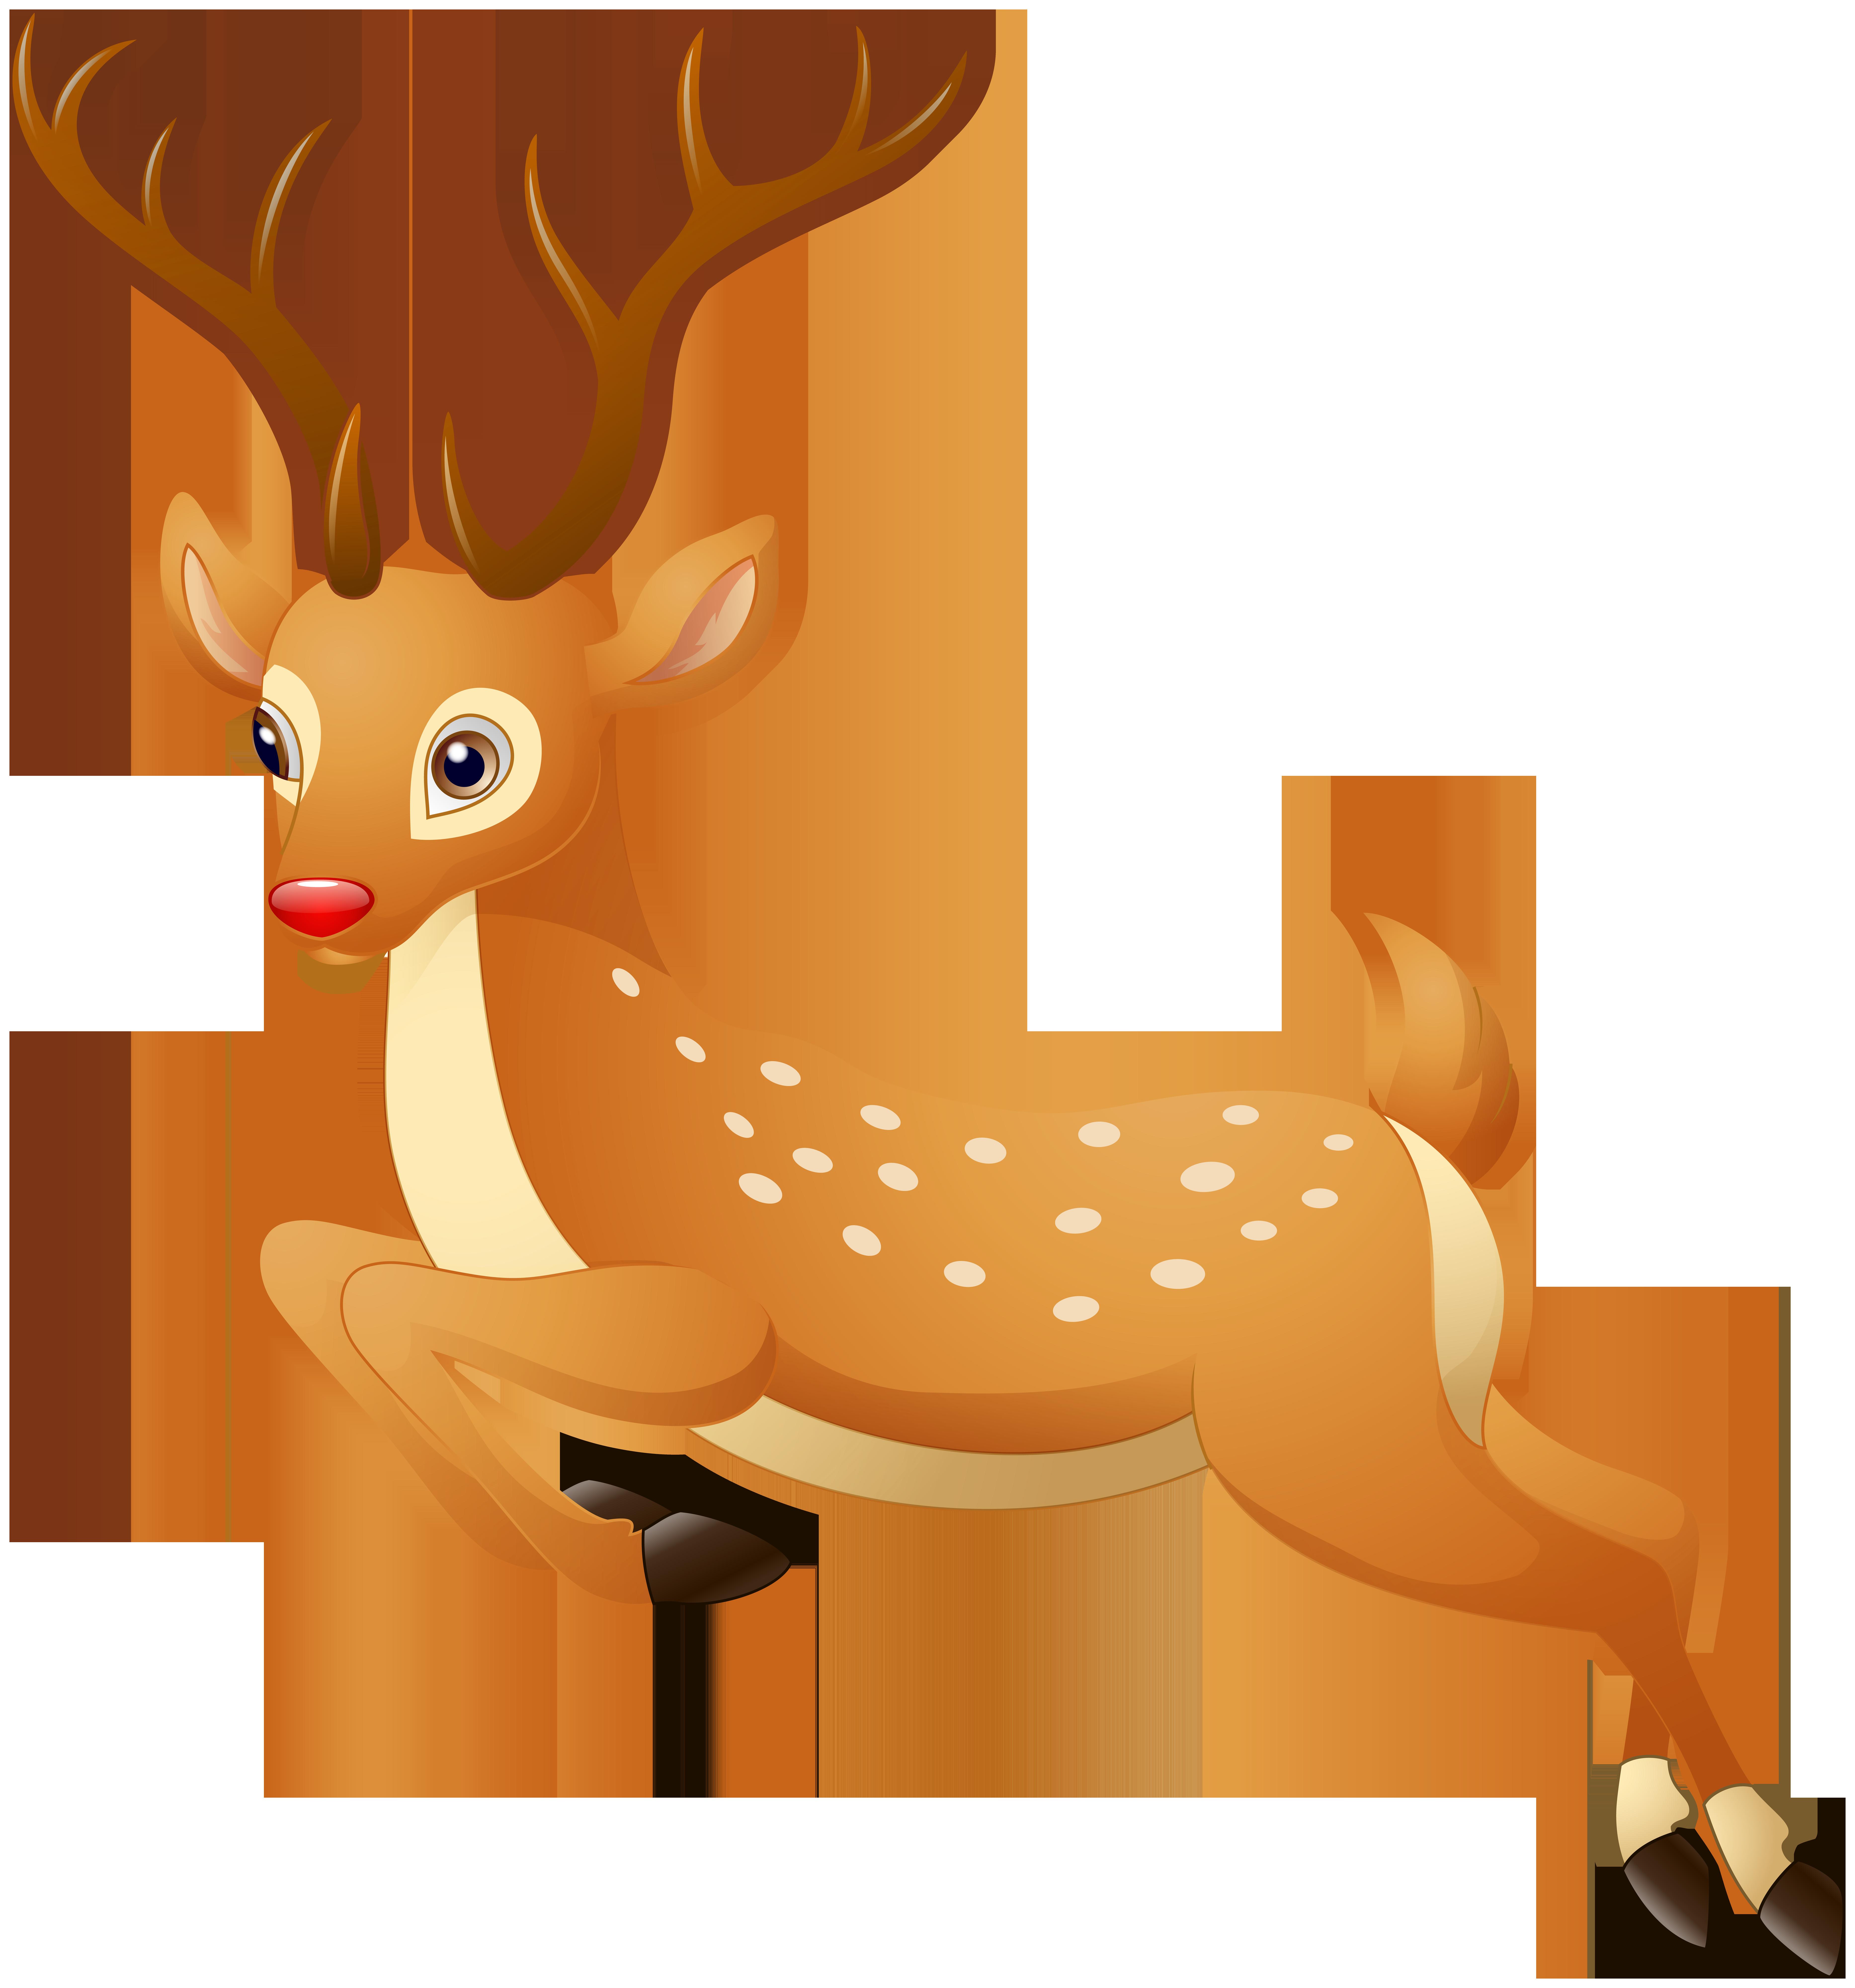 Rudolph clip art image. Clipart reindeer full size